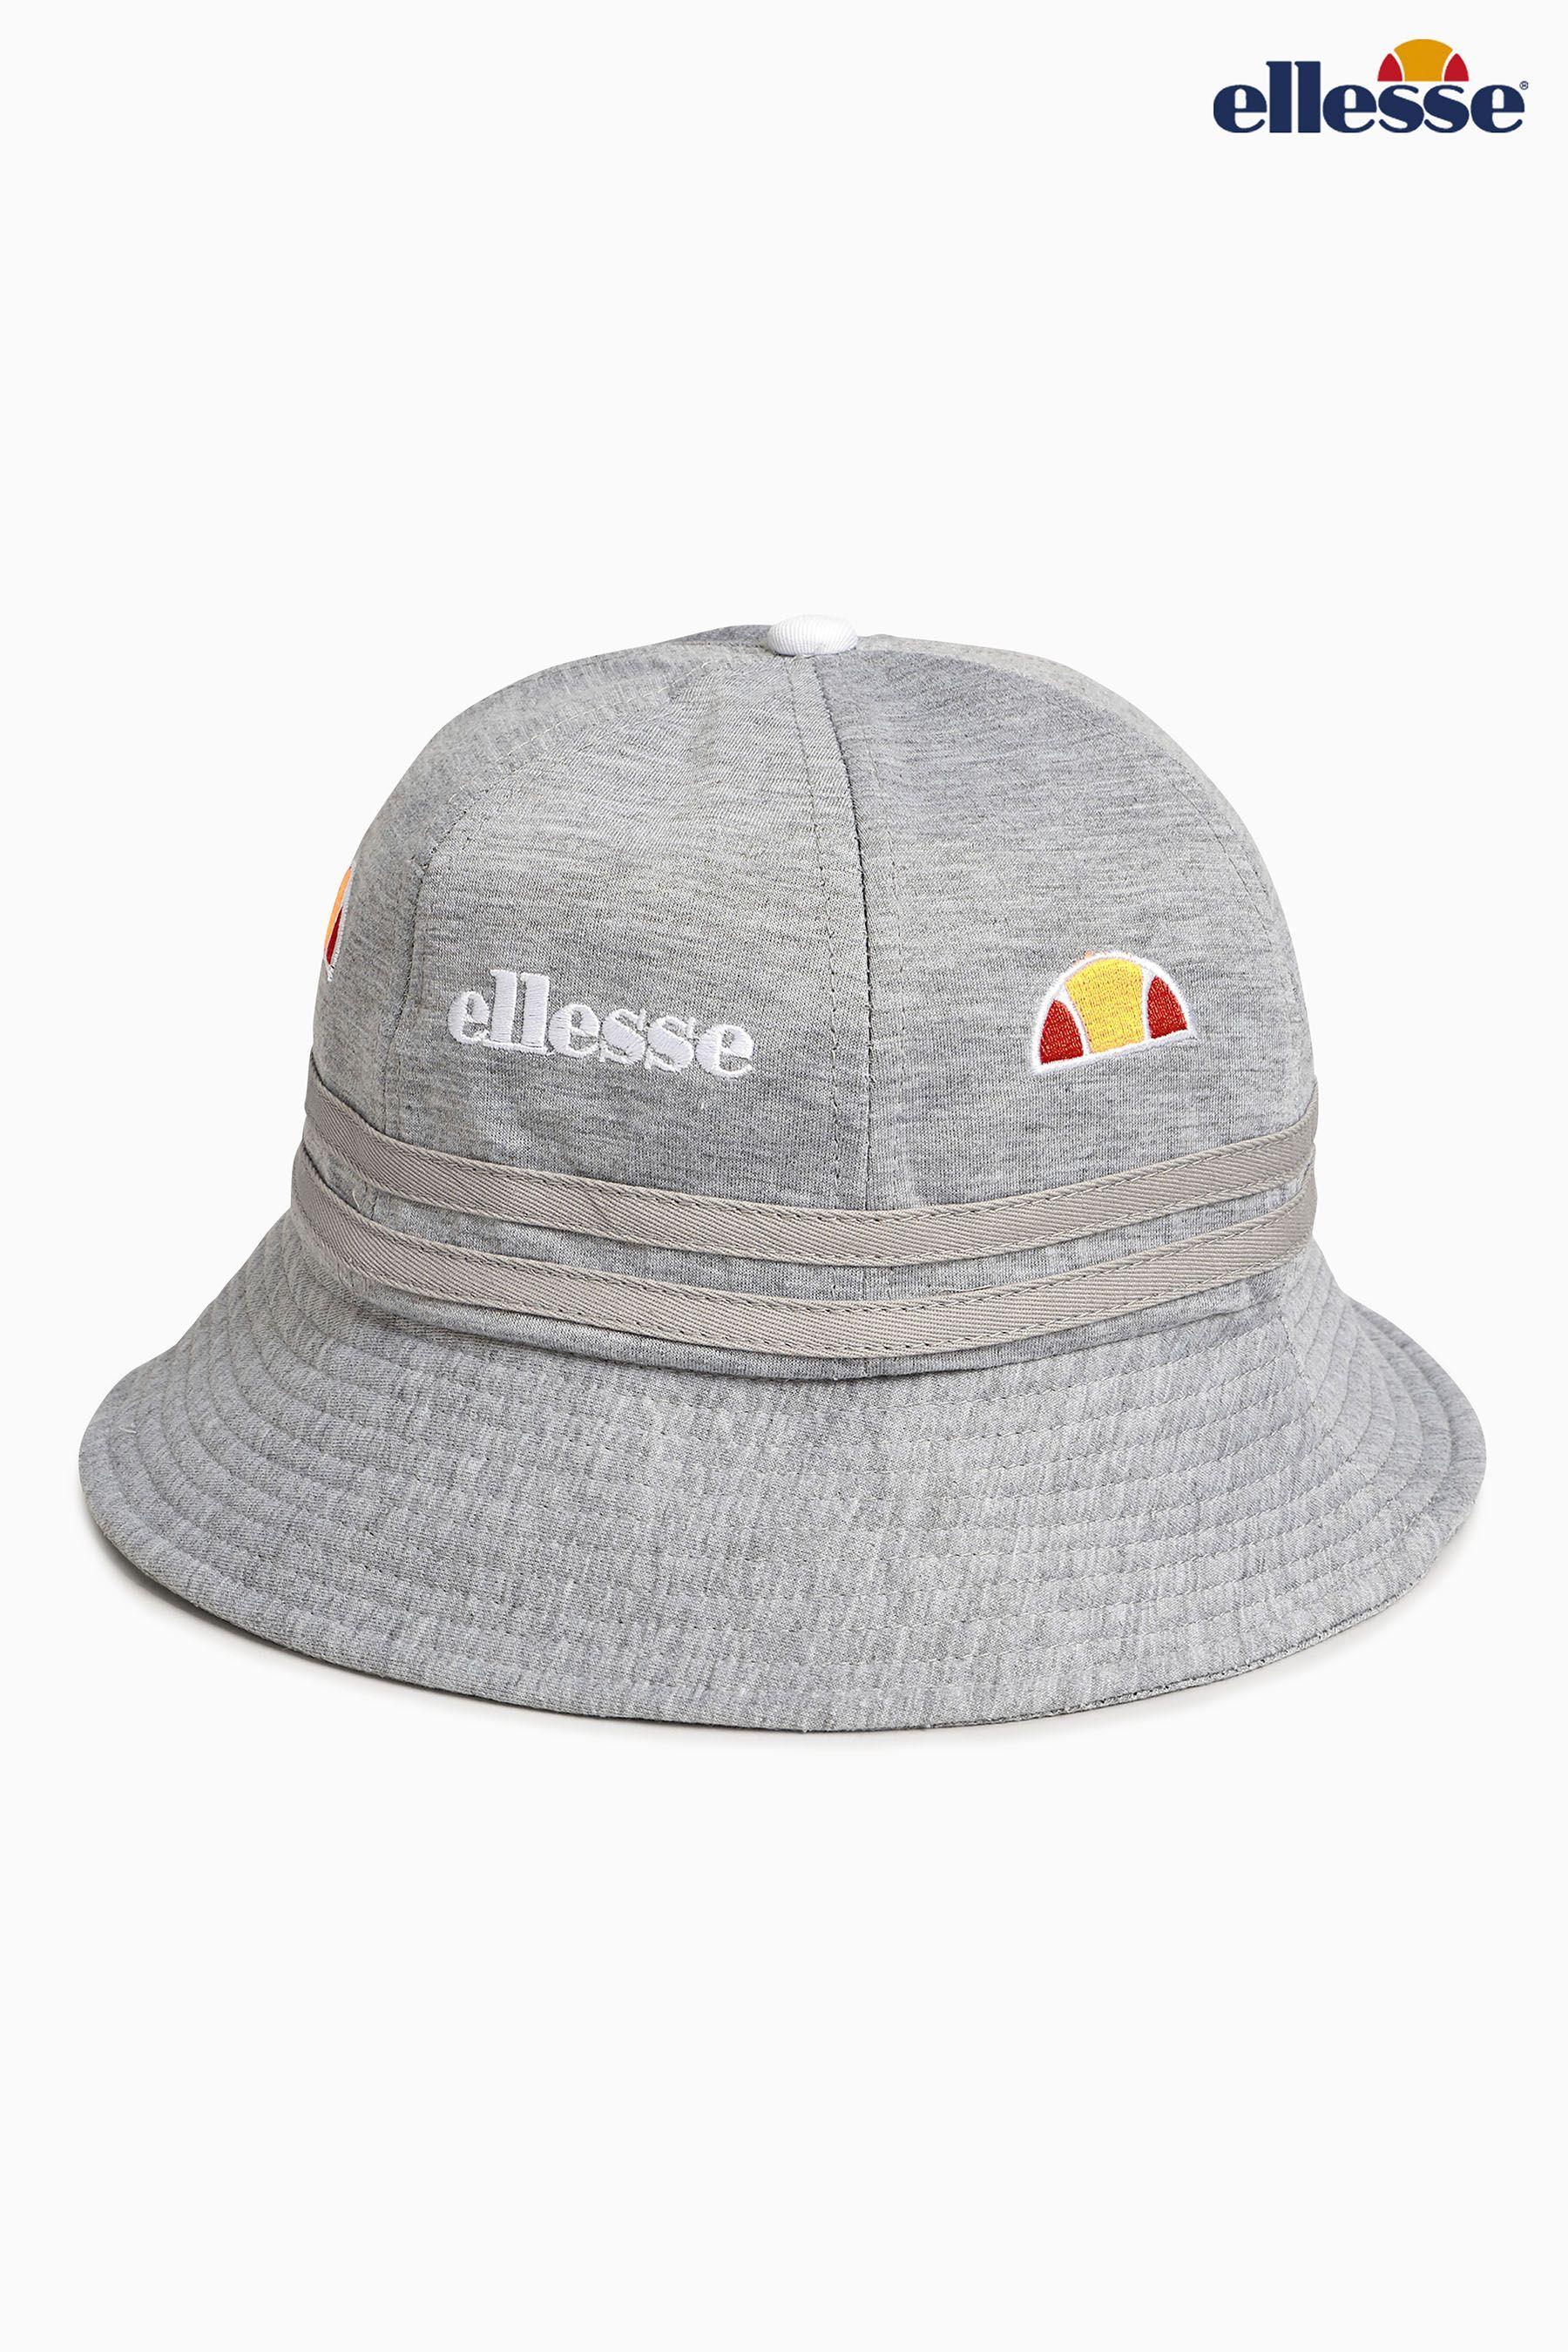 ed0465d5b5 Mens Ellesse Mateo Bucket Hat - Grey | Products | Hats, Baseball hats ...